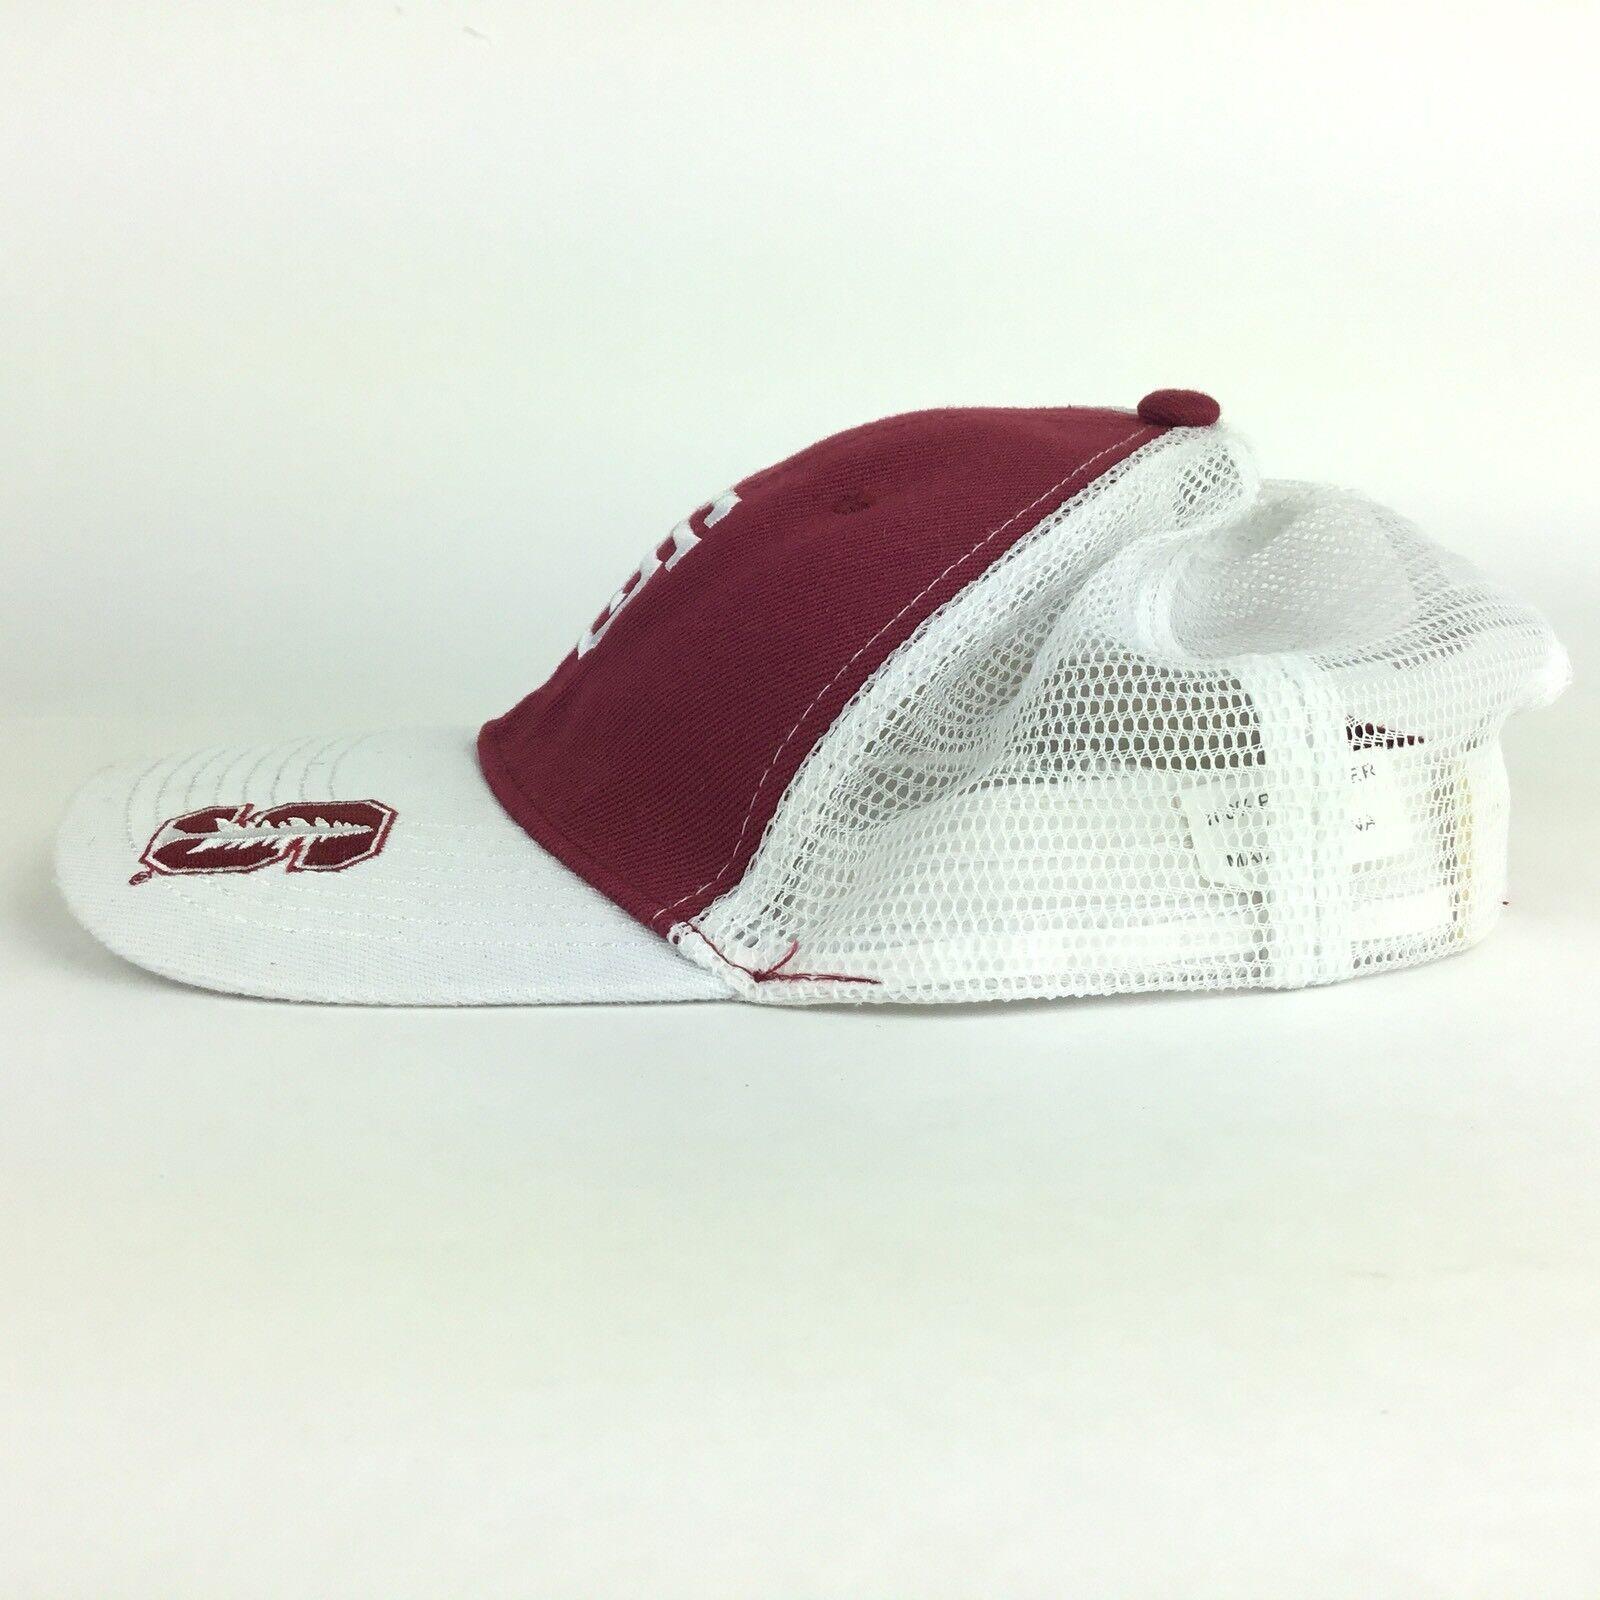 San Francisco Giants / Stanford Cardinals Meshback Baseball Cap Adj Hat Adj Cap Sm-Med 525ac9